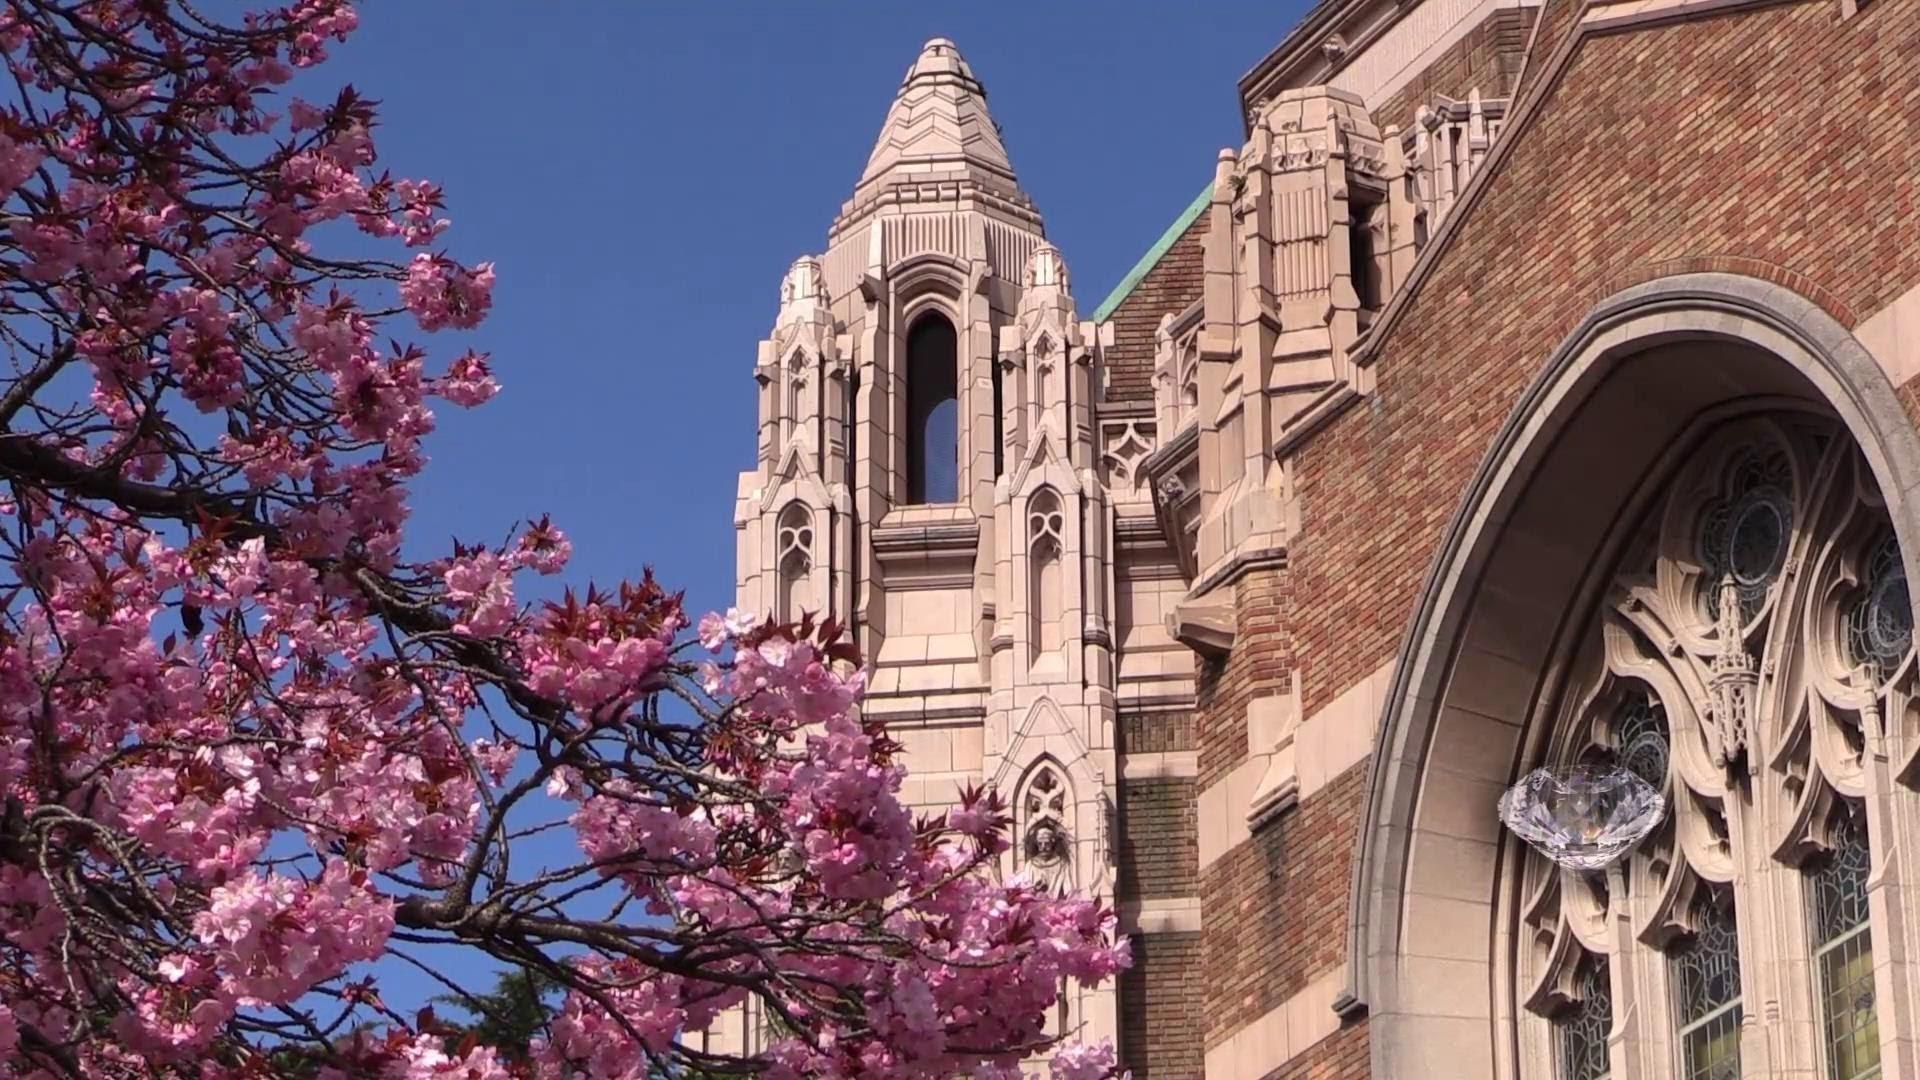 Spring at University of Washington 1080p HD